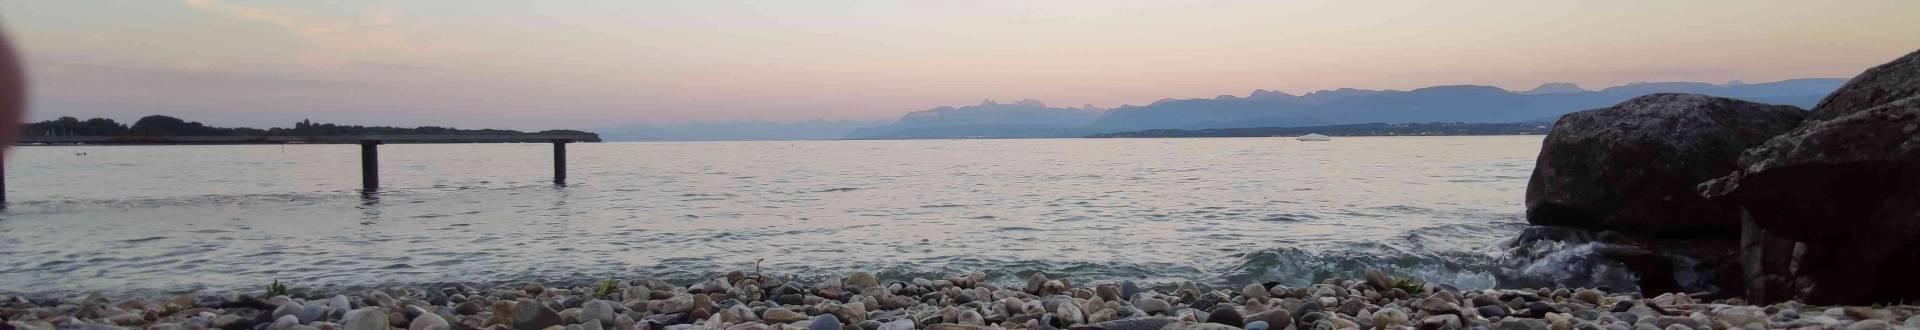 Adgency Online | Crassier Suisse | visite virtuelle 360 3D VR